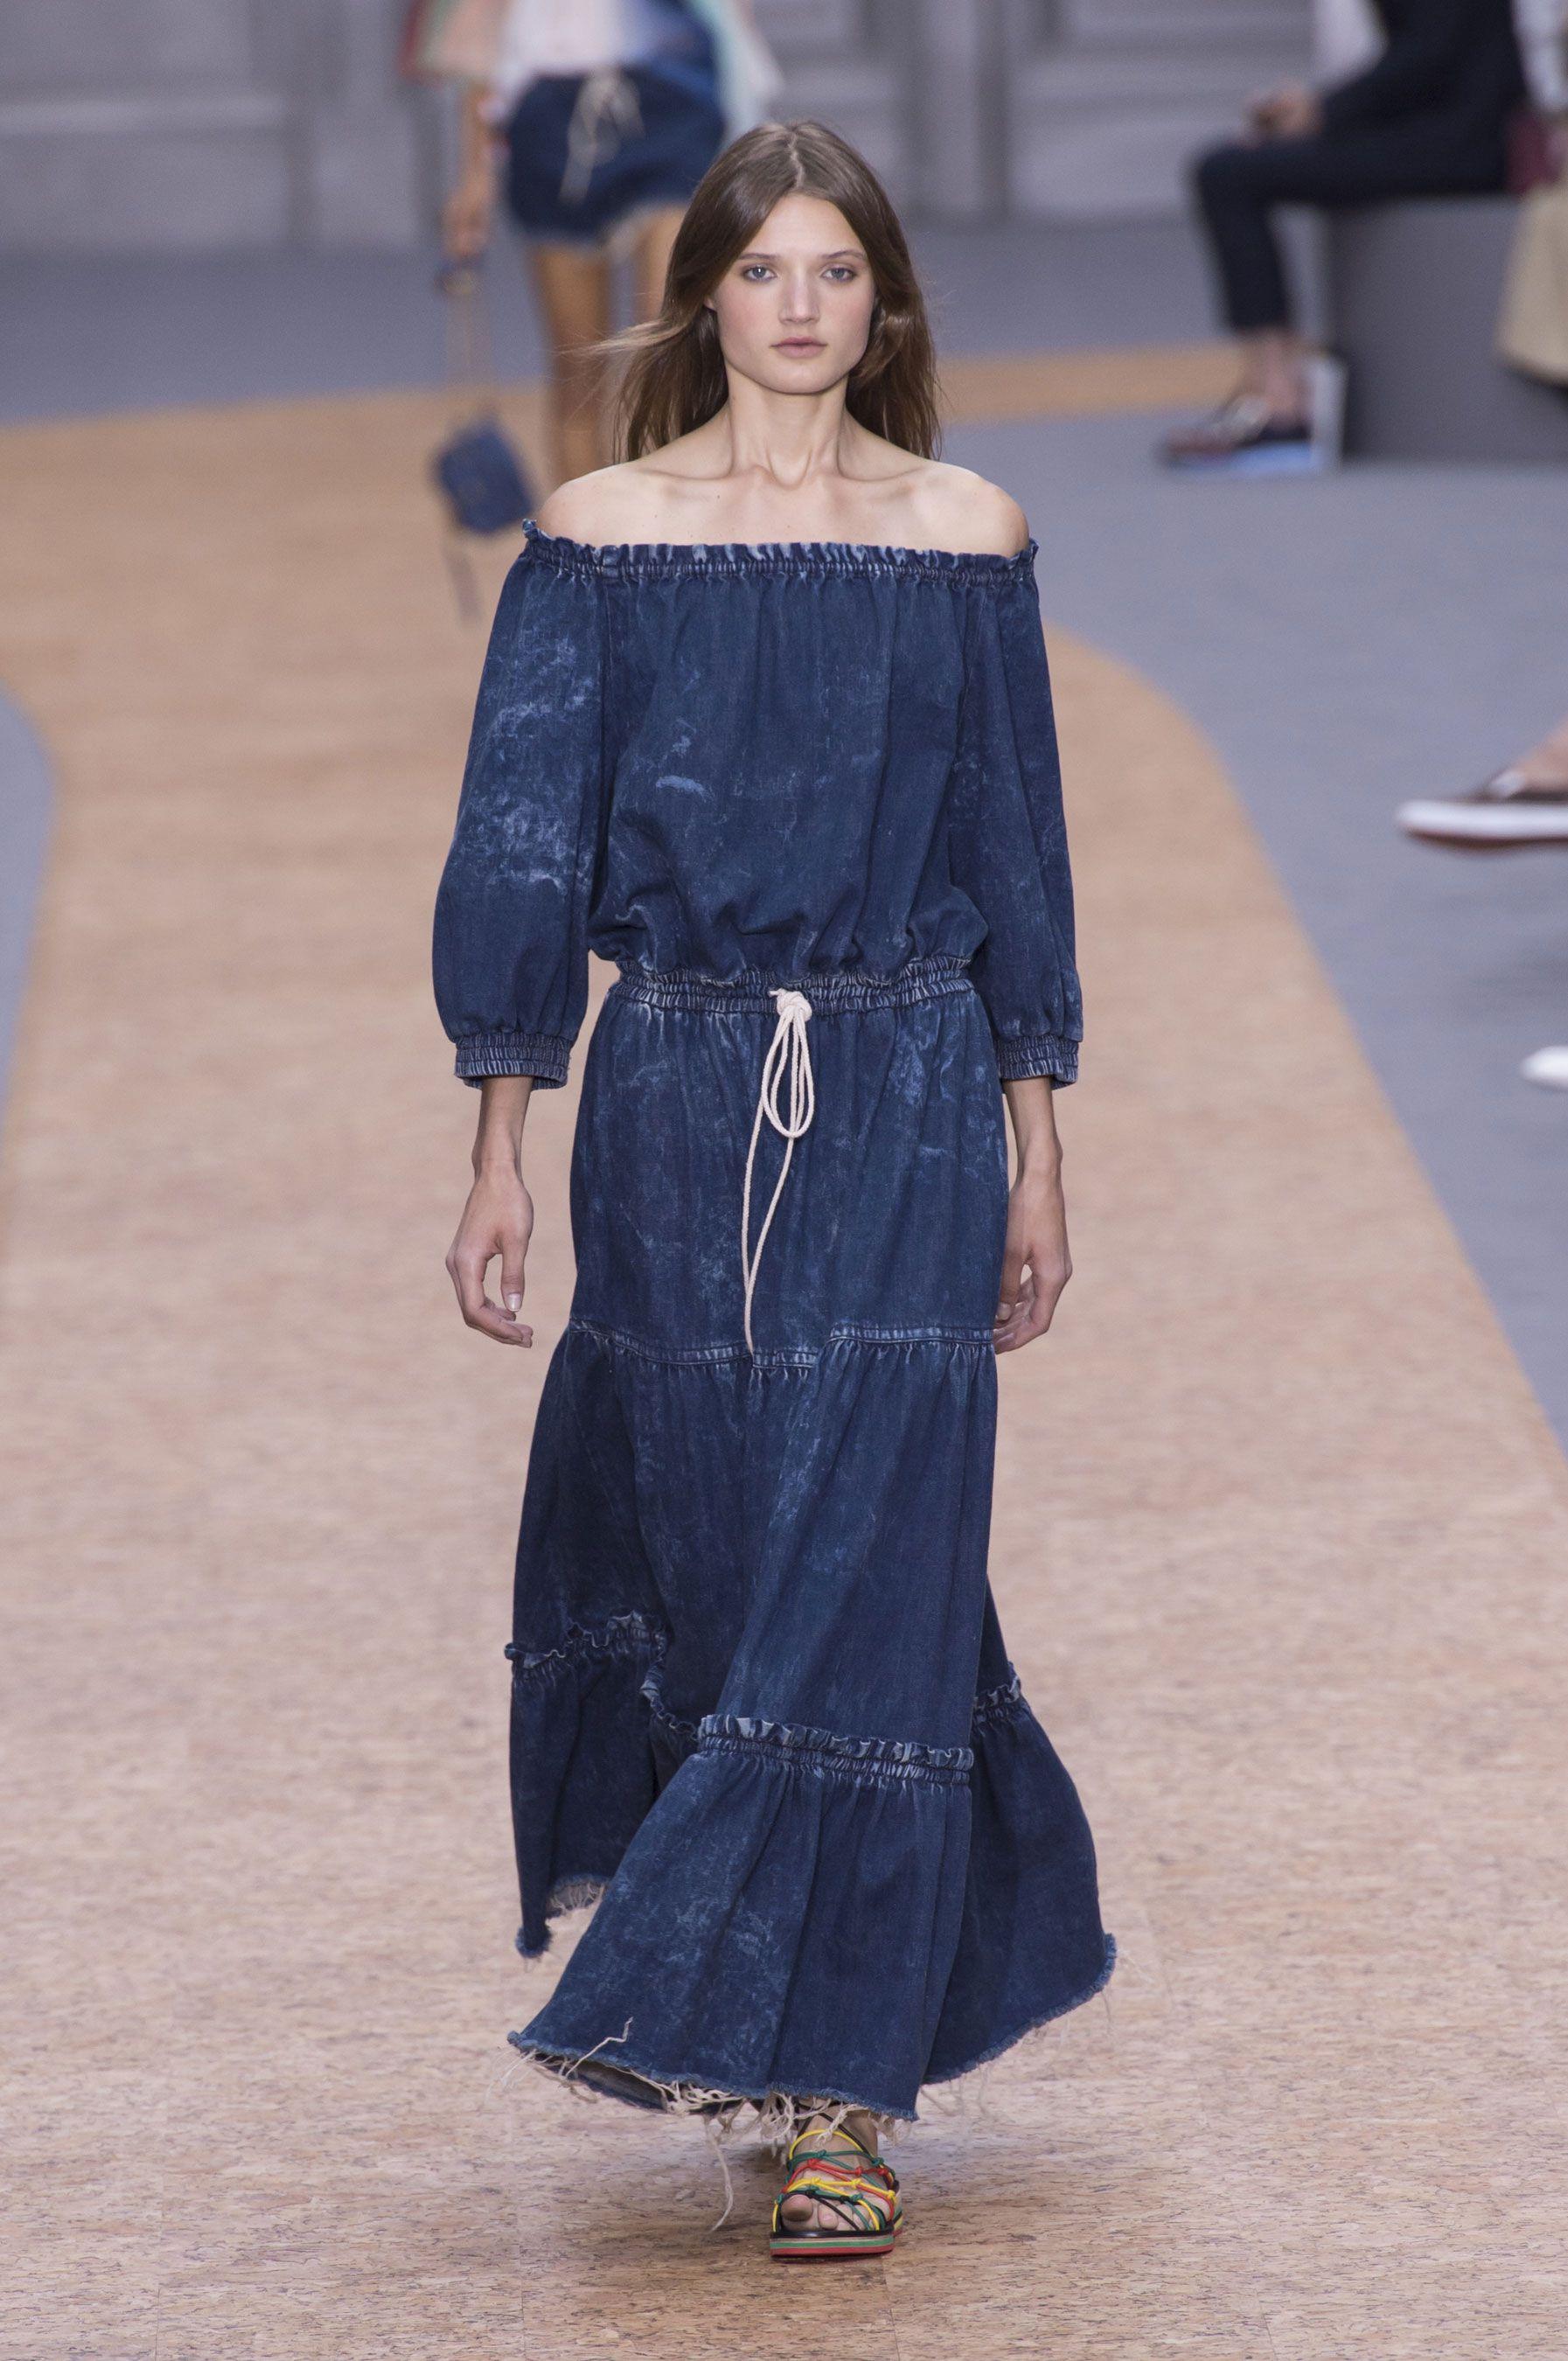 【Chloé】パリ・コレクションを鑑賞しにファッションウィークのパリへ!【2016年SS】